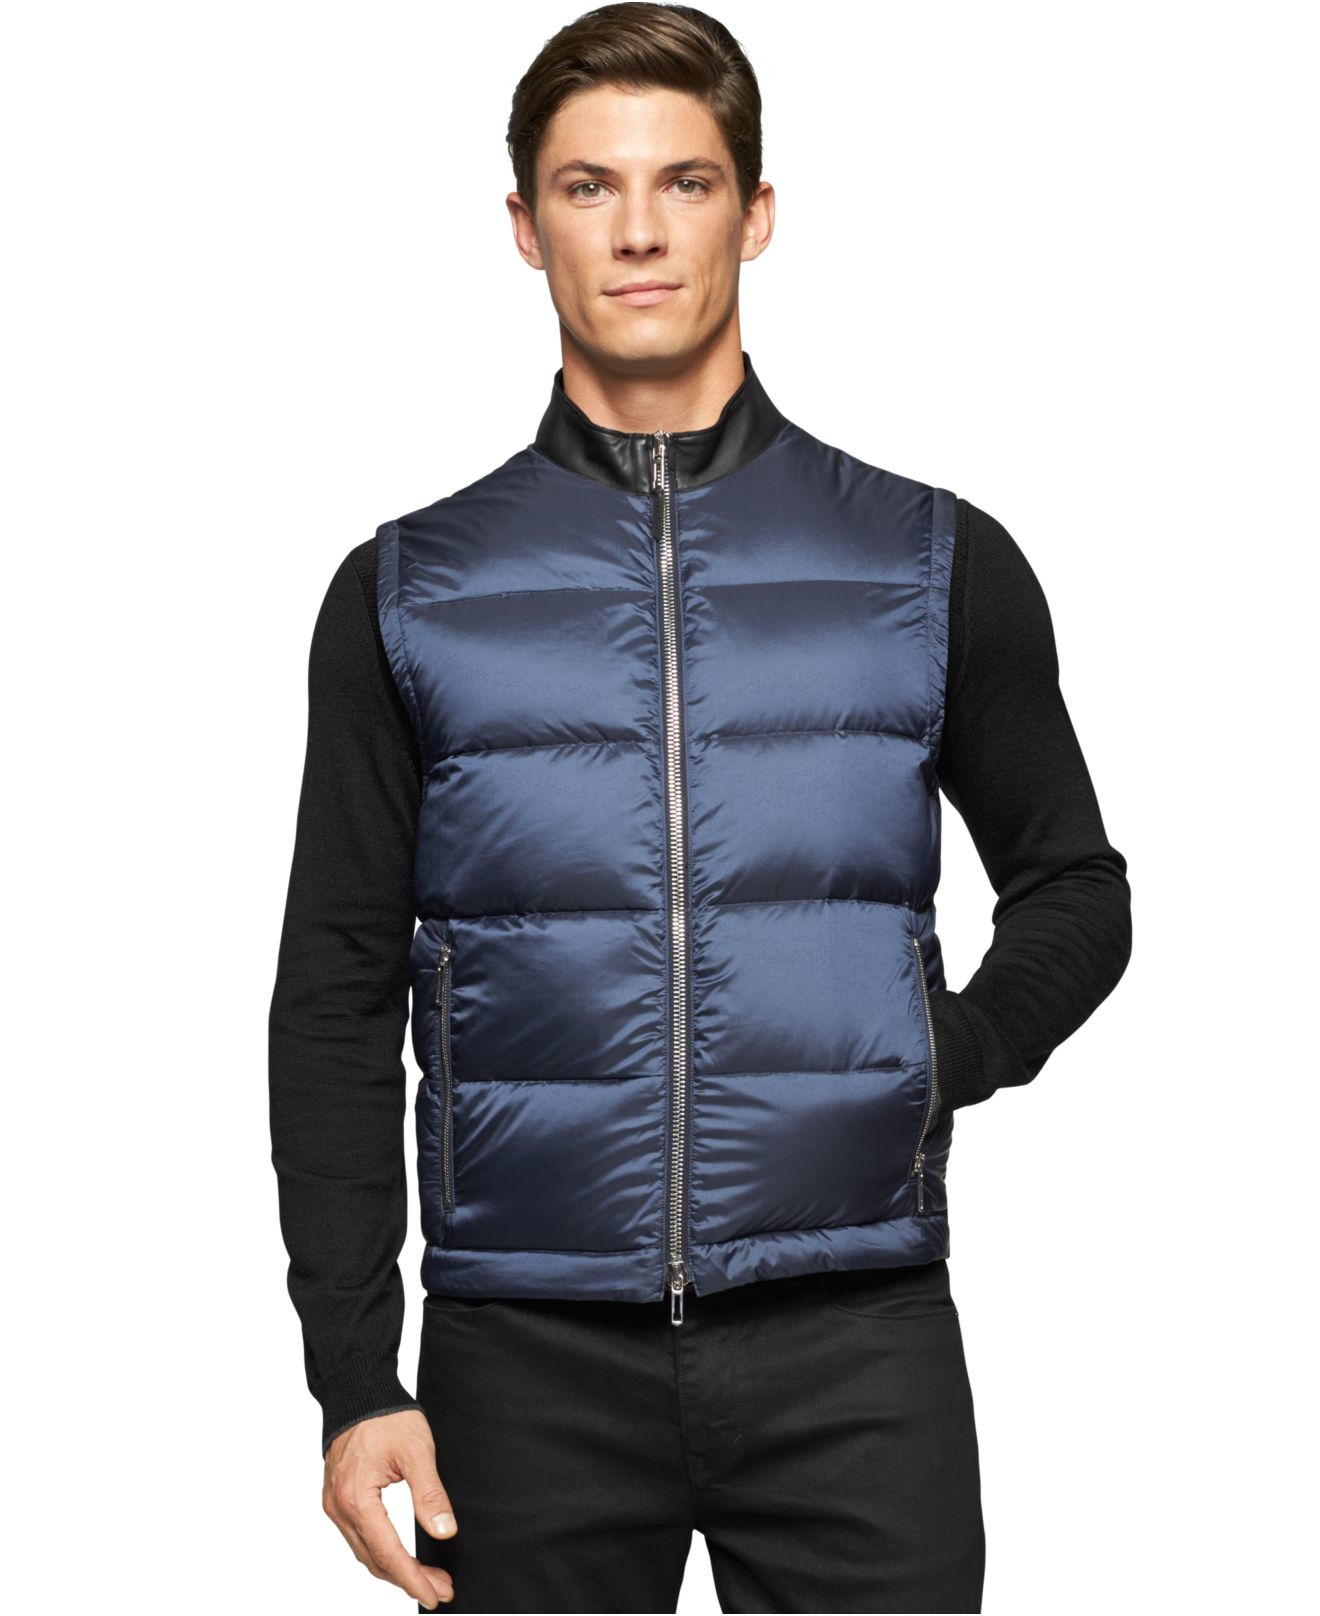 Calvin Klein Zip front Puffer Vest In Blue For Men Lyst